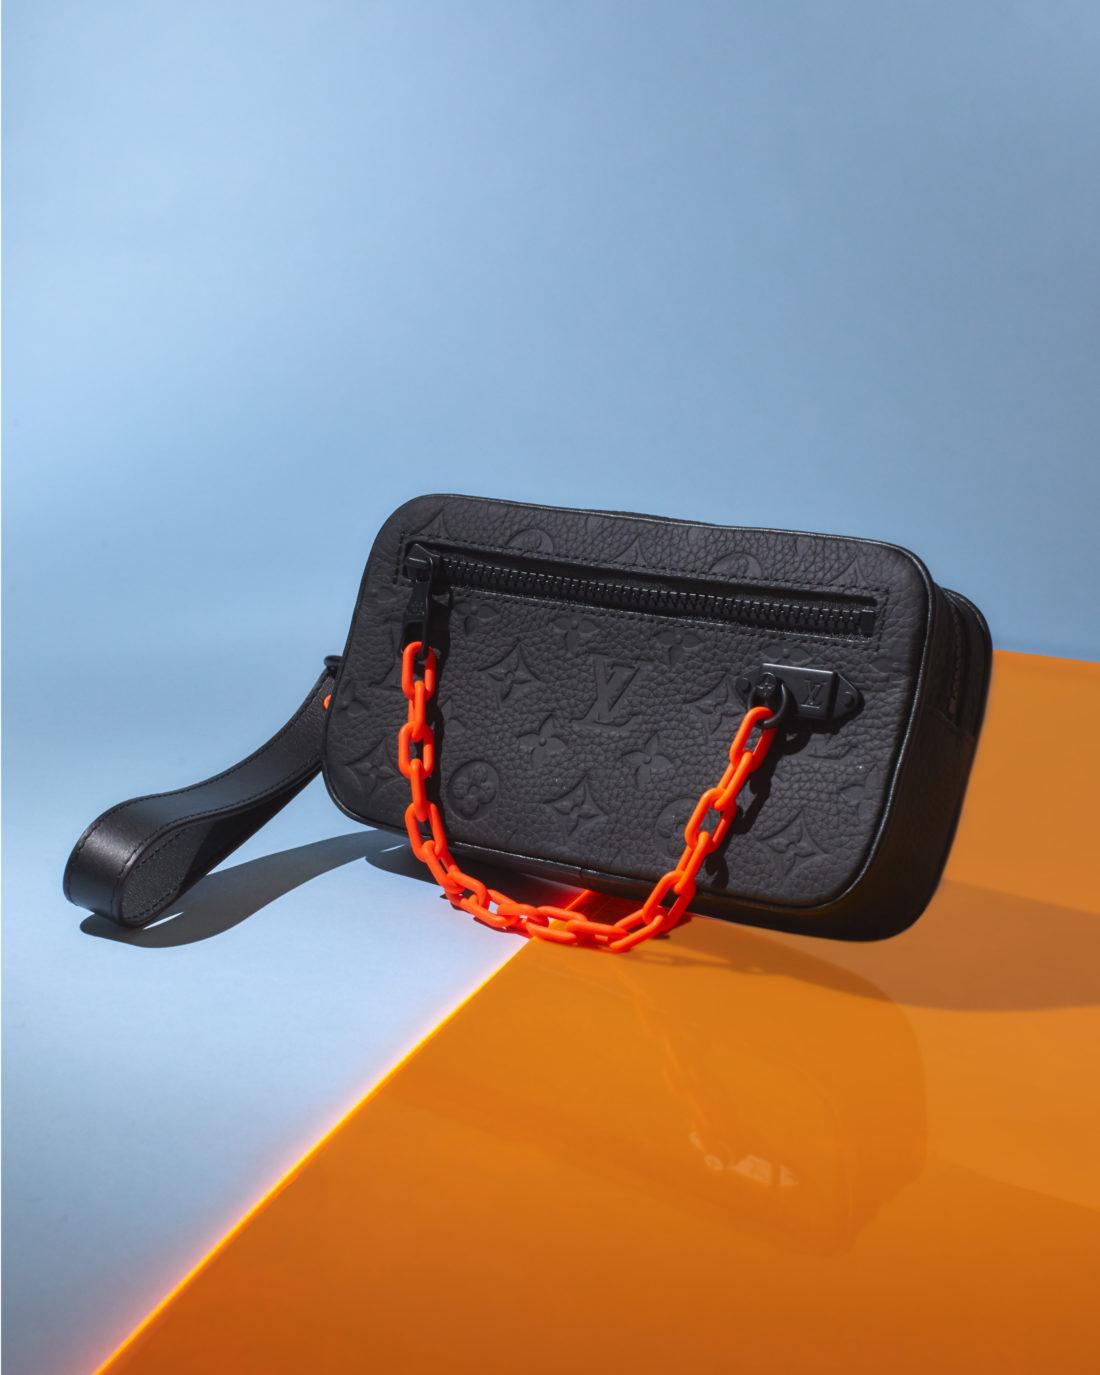 StockX Bags: Win The Louis Vuitton Pochette Designed By Virgil Abloh